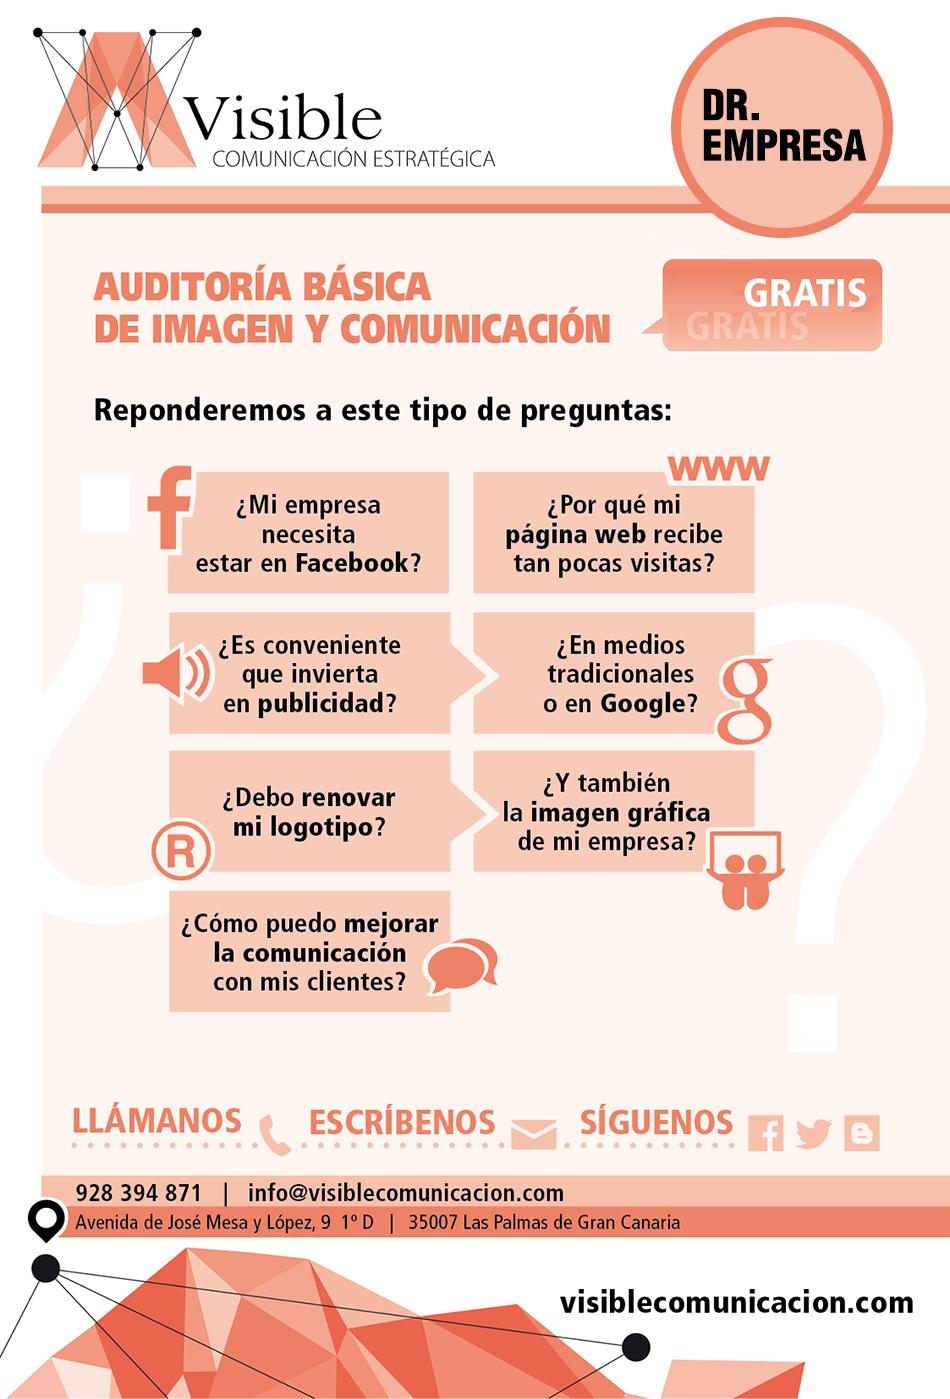 servicio-gratuito-dr-empresa-visible-comunicacion